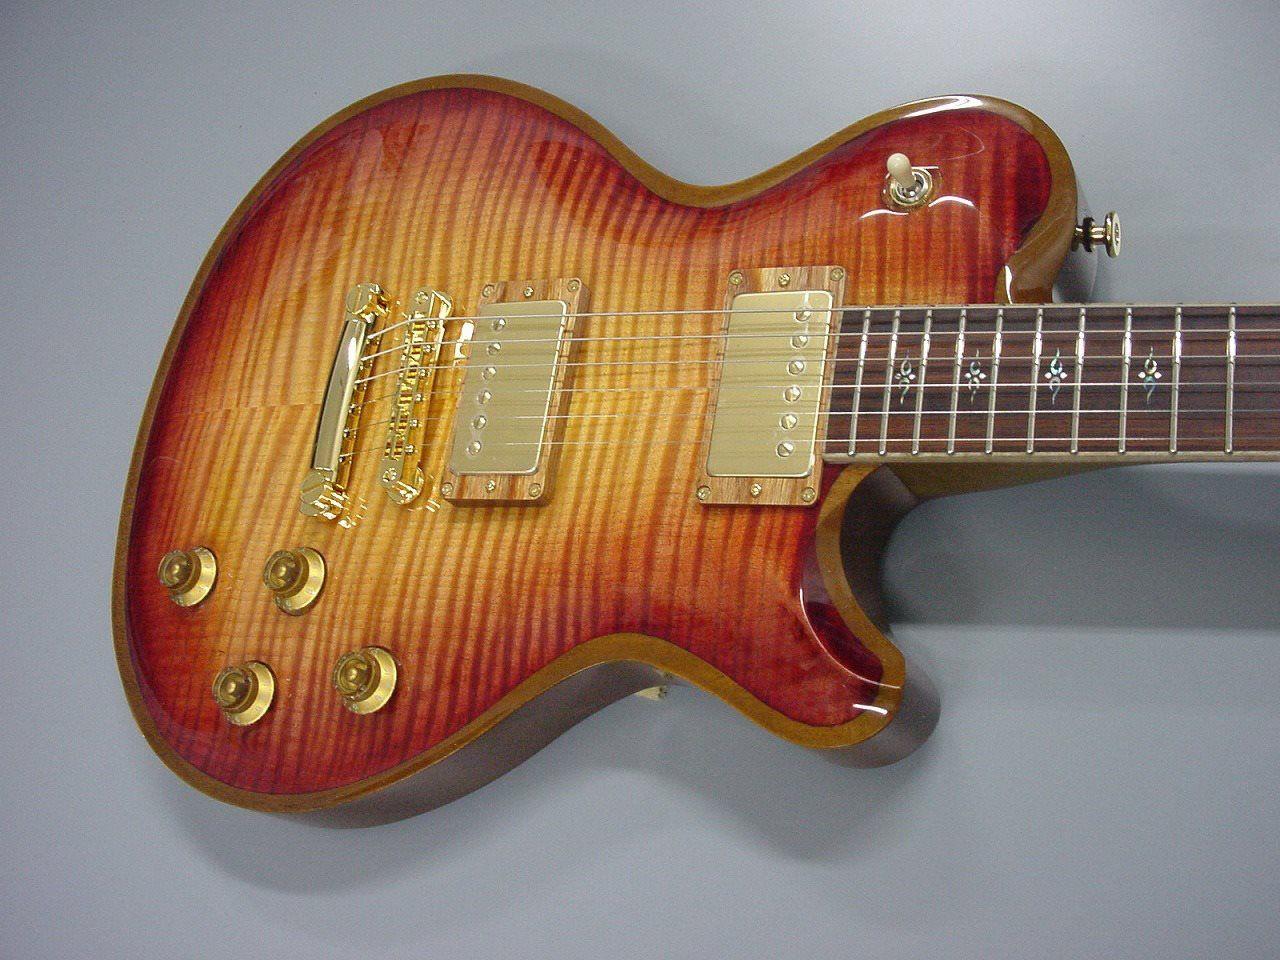 Fgn Fujigen Virtuoso Flame Fl Guitar In Sunrise Burst Cool Guitar Electric Guitar Guitar